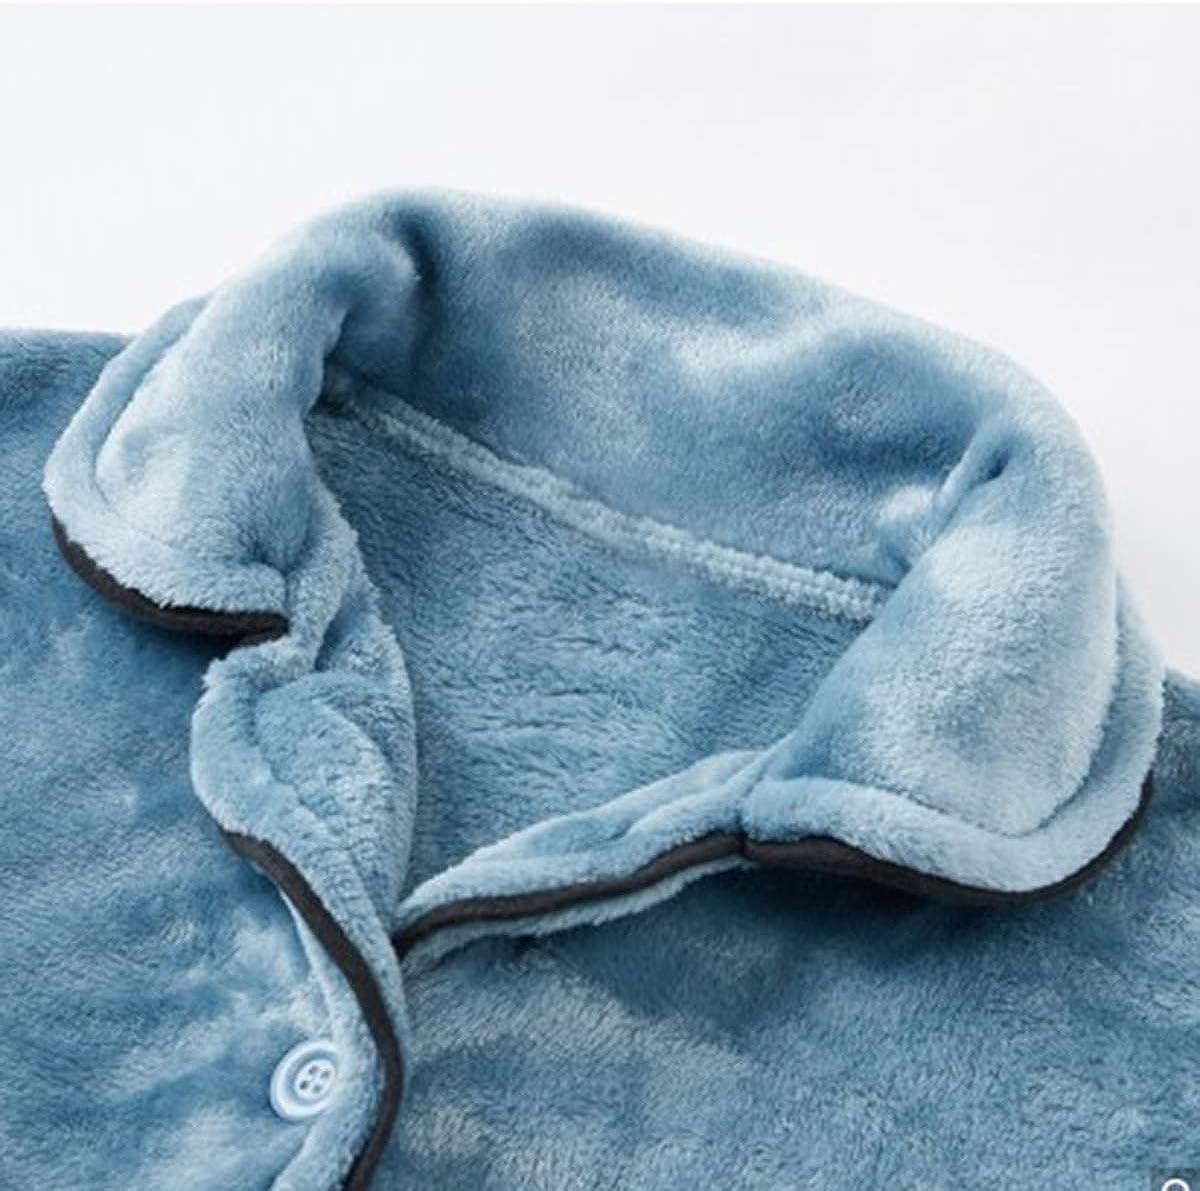 Unifizz Teen Girls 2-Piece Warm Fleece Lingerie Long Sleeve Nightgowns Pajama Top Pants Pjs Set Button Down Soft Casual